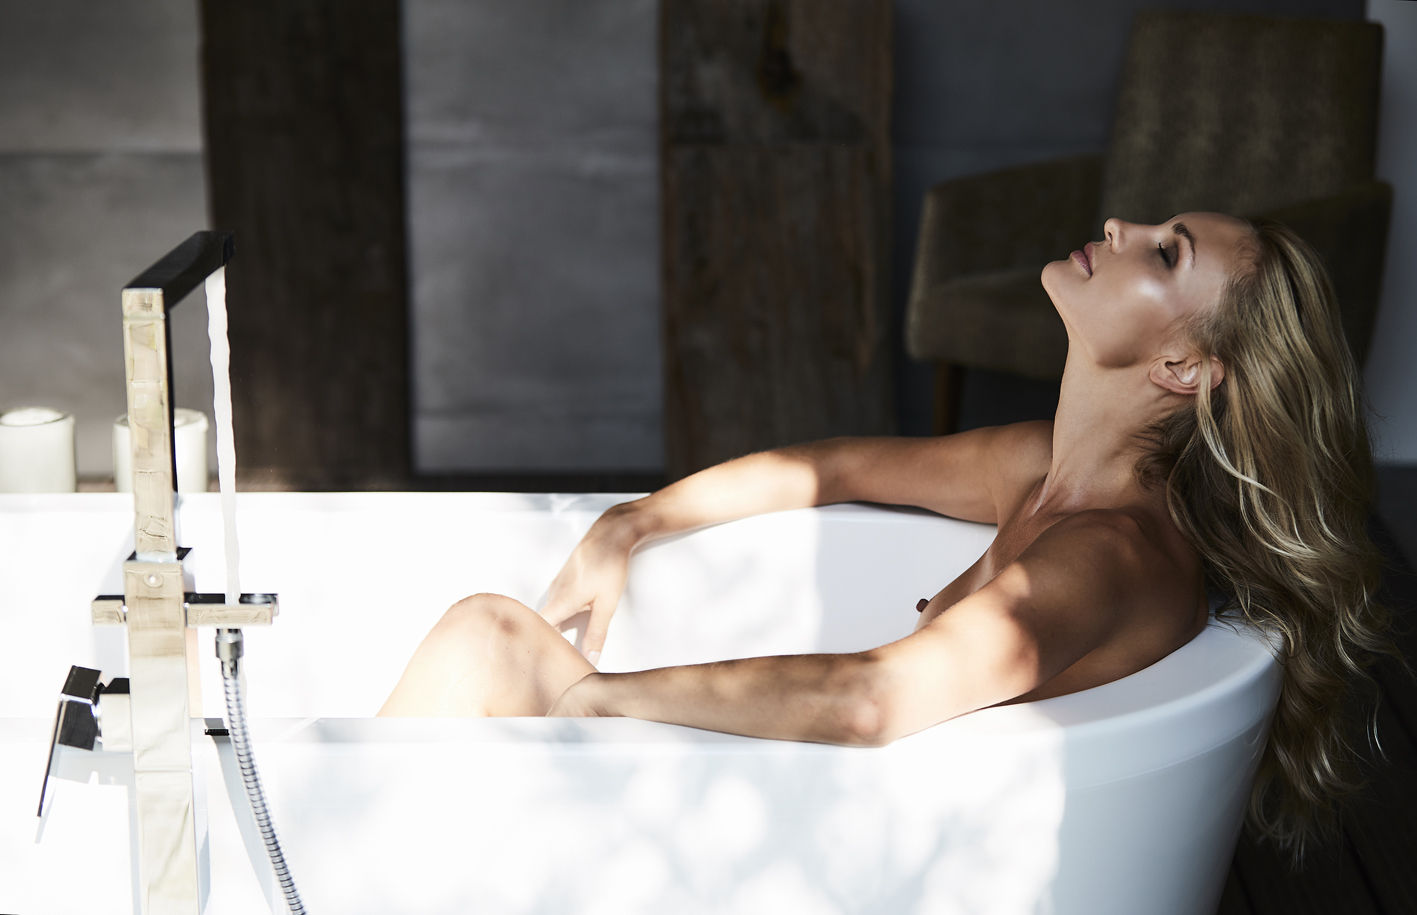 Take_A_Bath_by_TORSTEN_RUPPERT_01.jpg